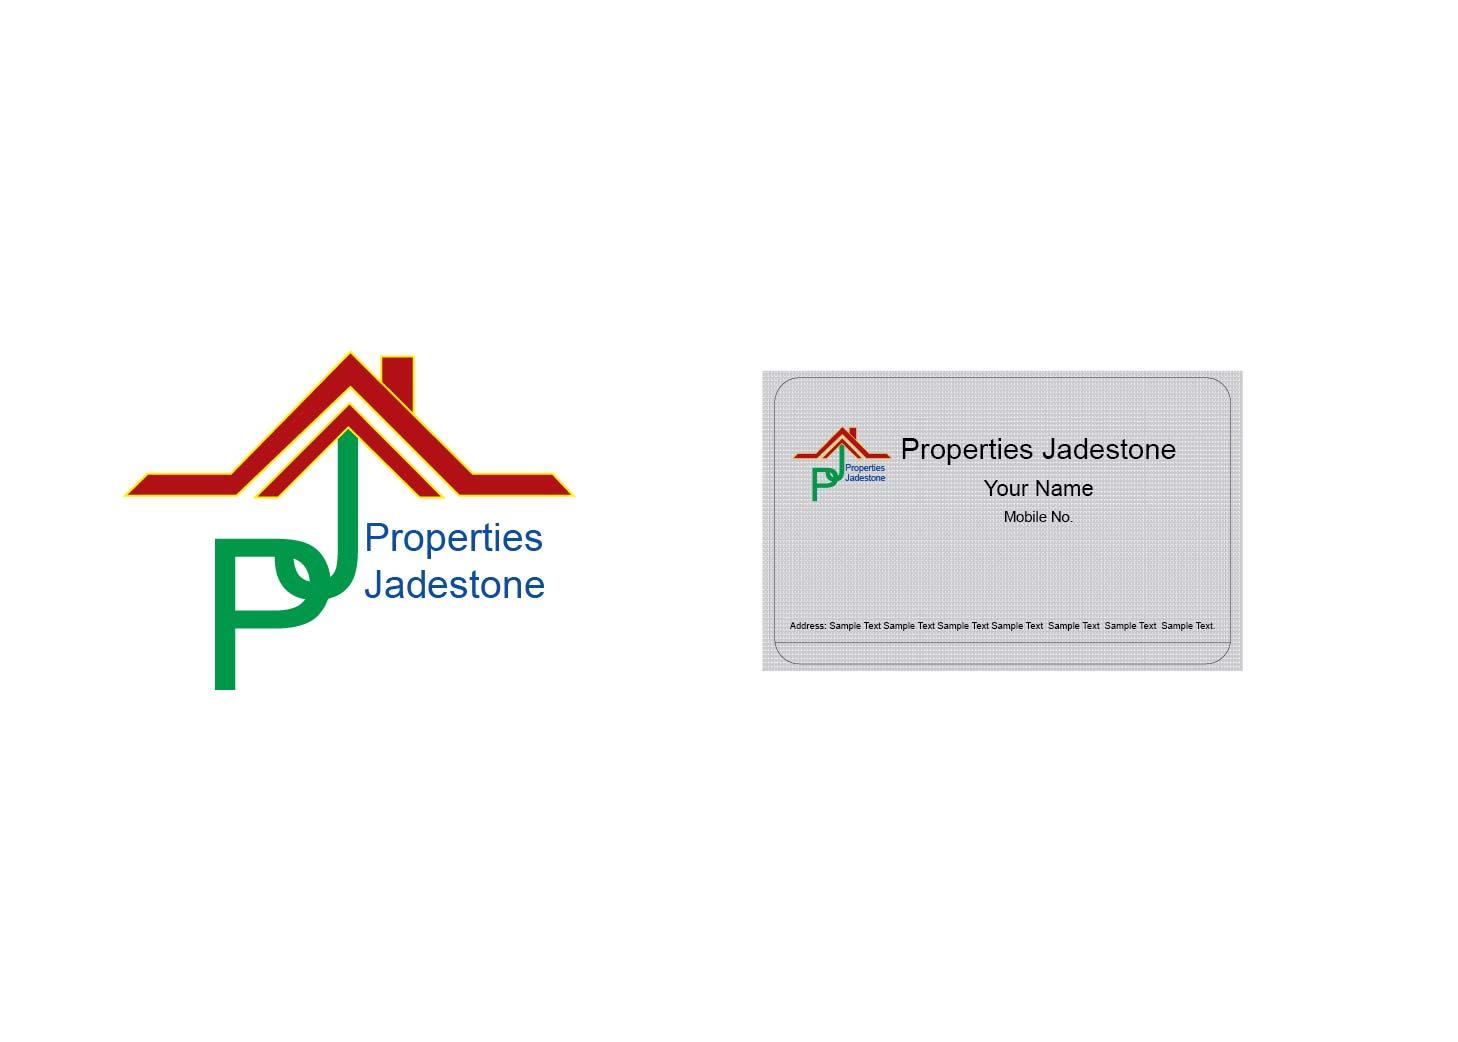 Modern Professional Real Estate Logo Design For Jadestone